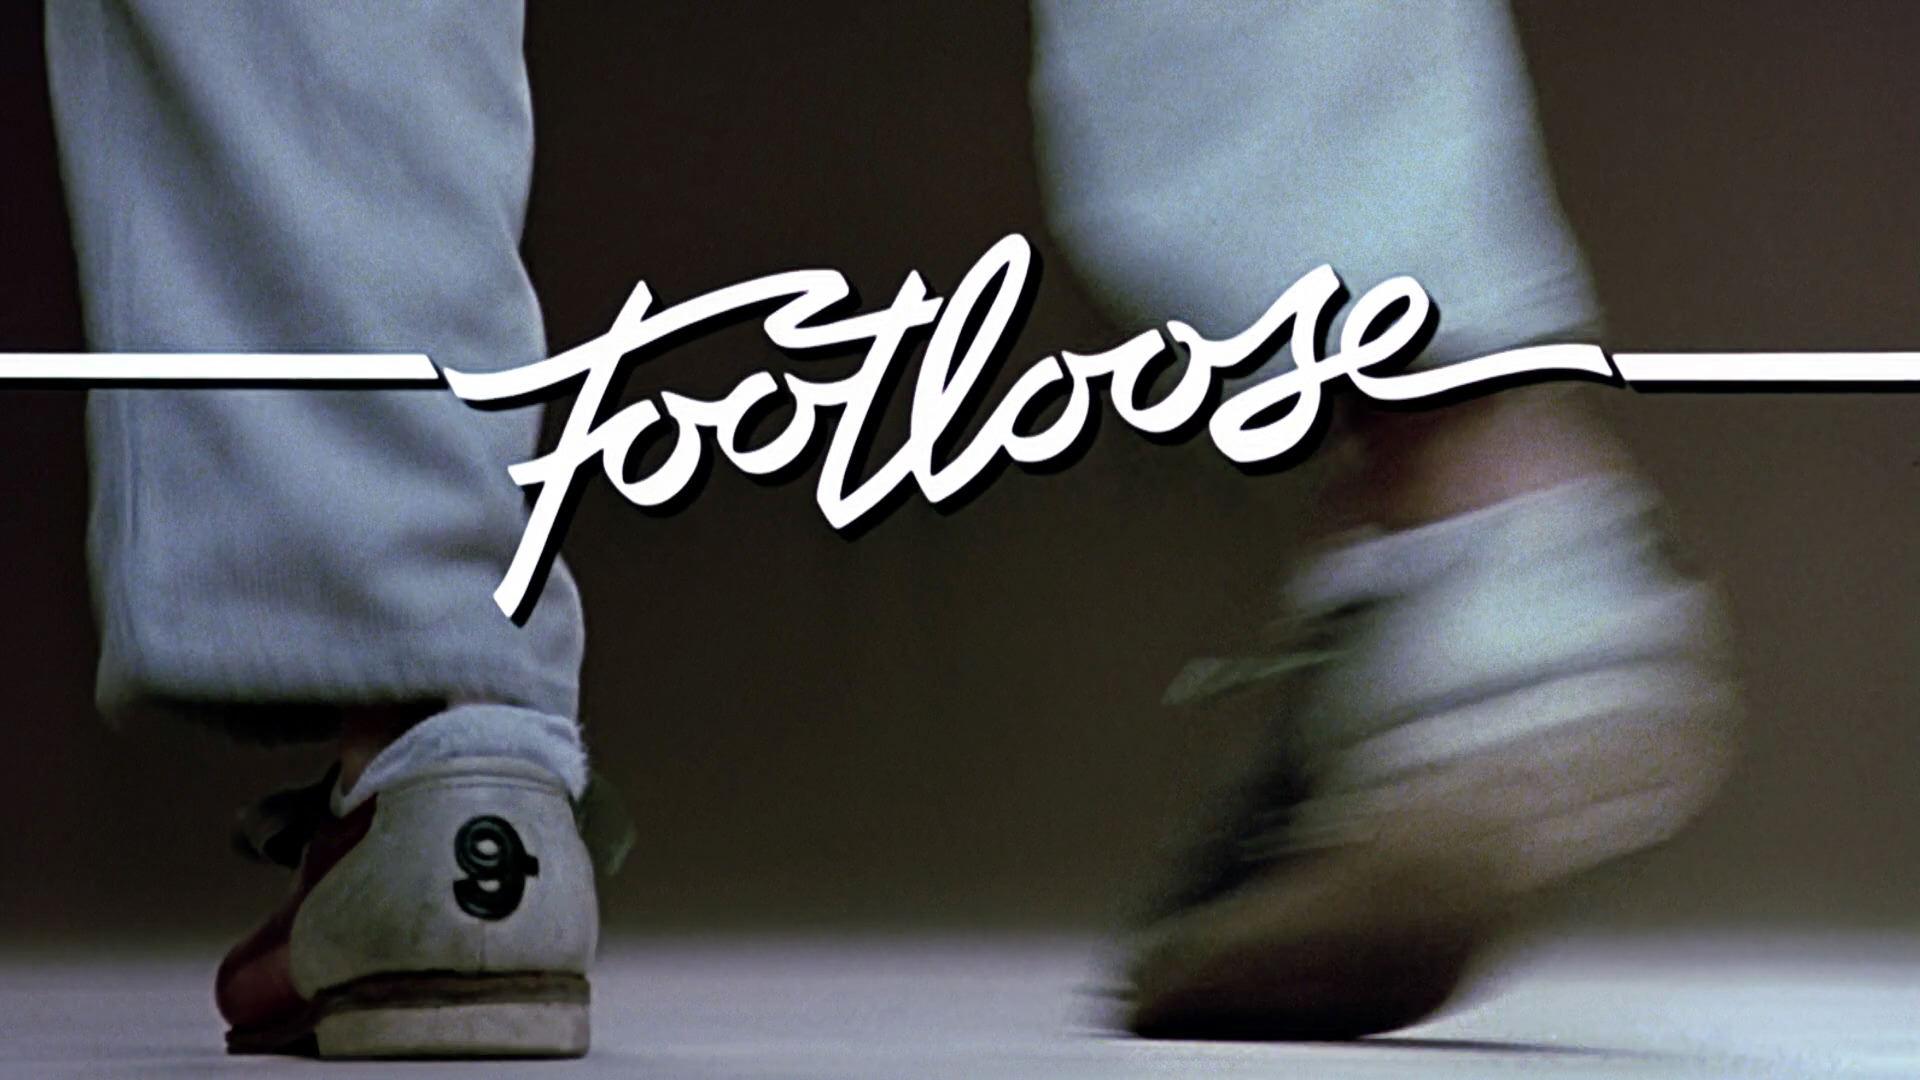 footloose-movie-screencaps.com-.jpg